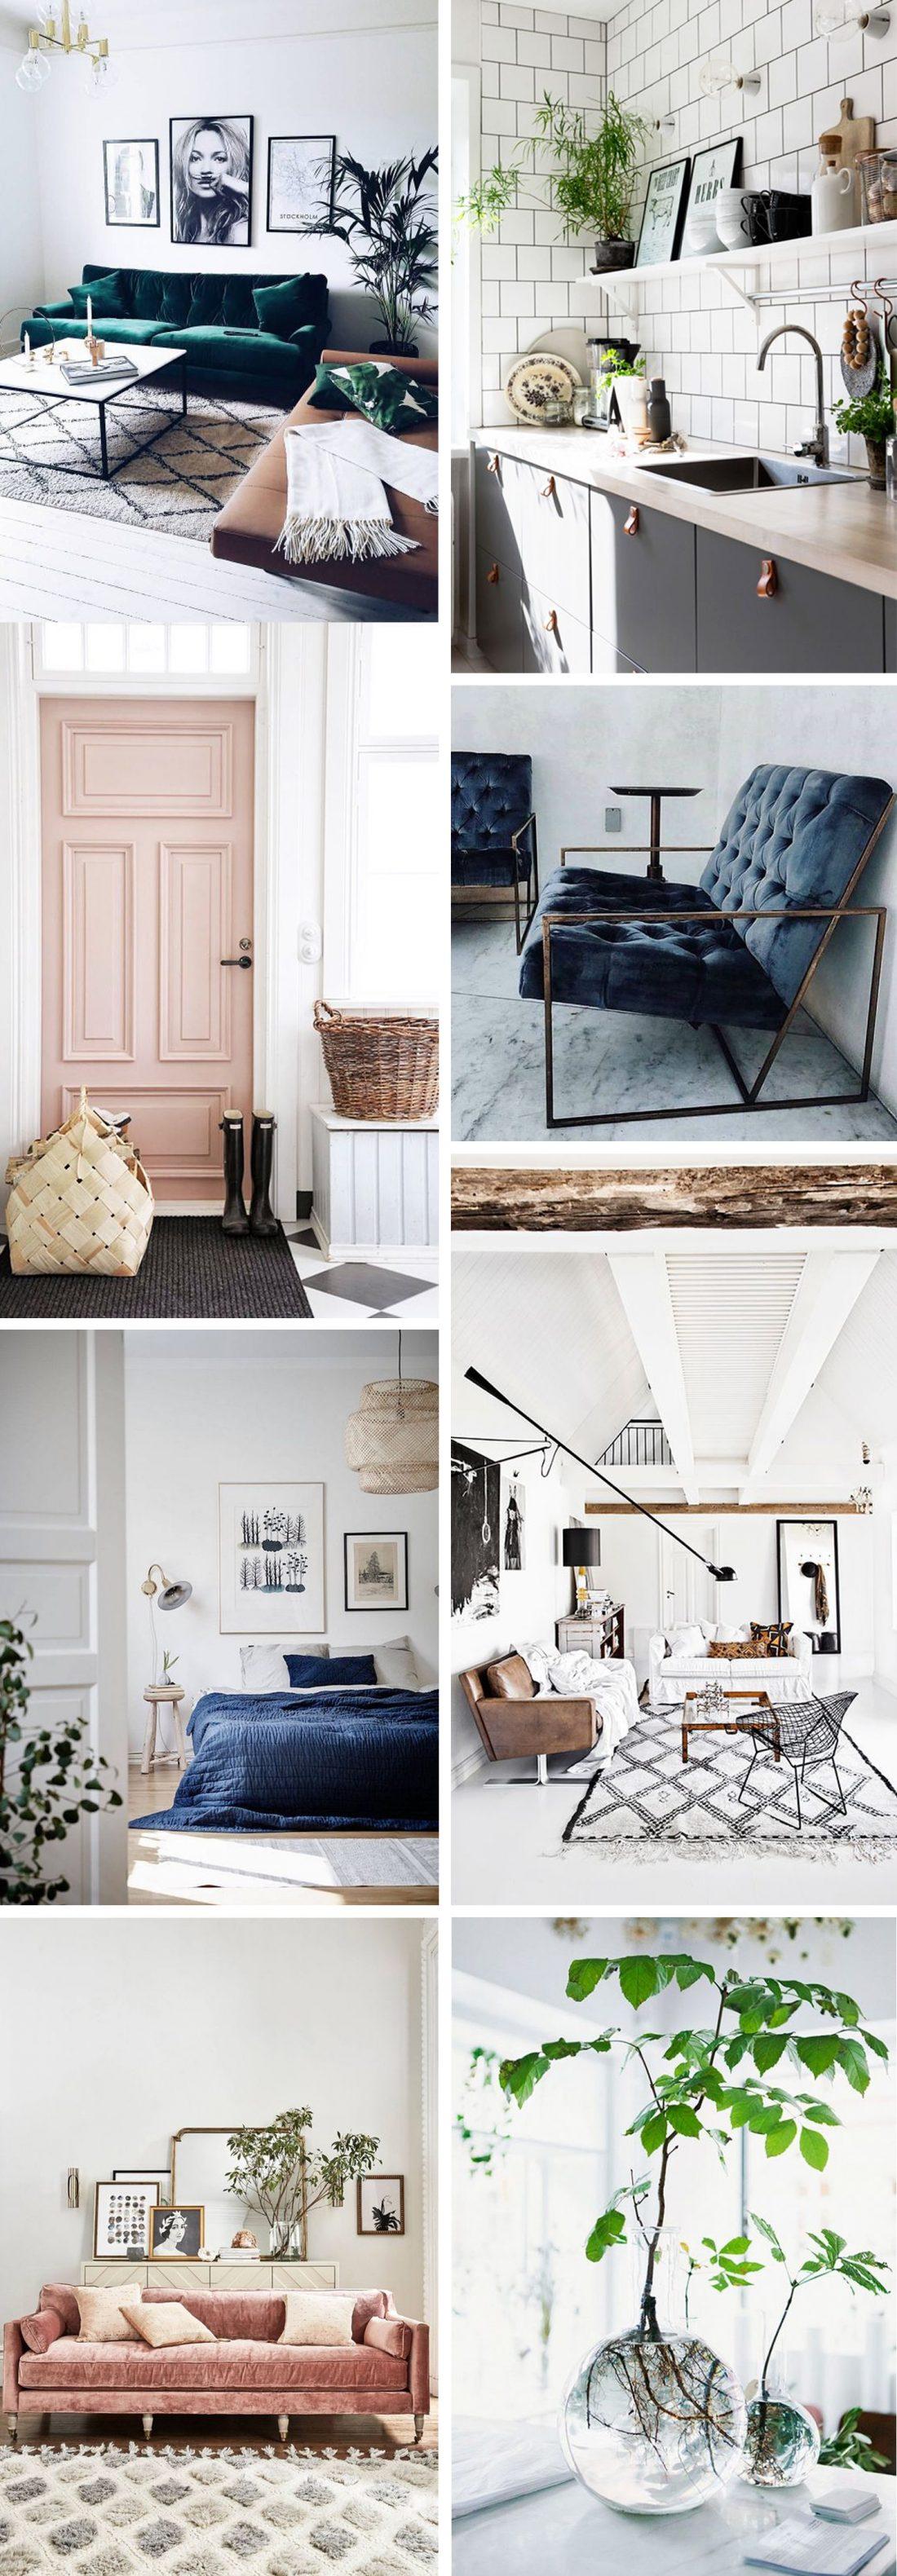 interior-design.jpg